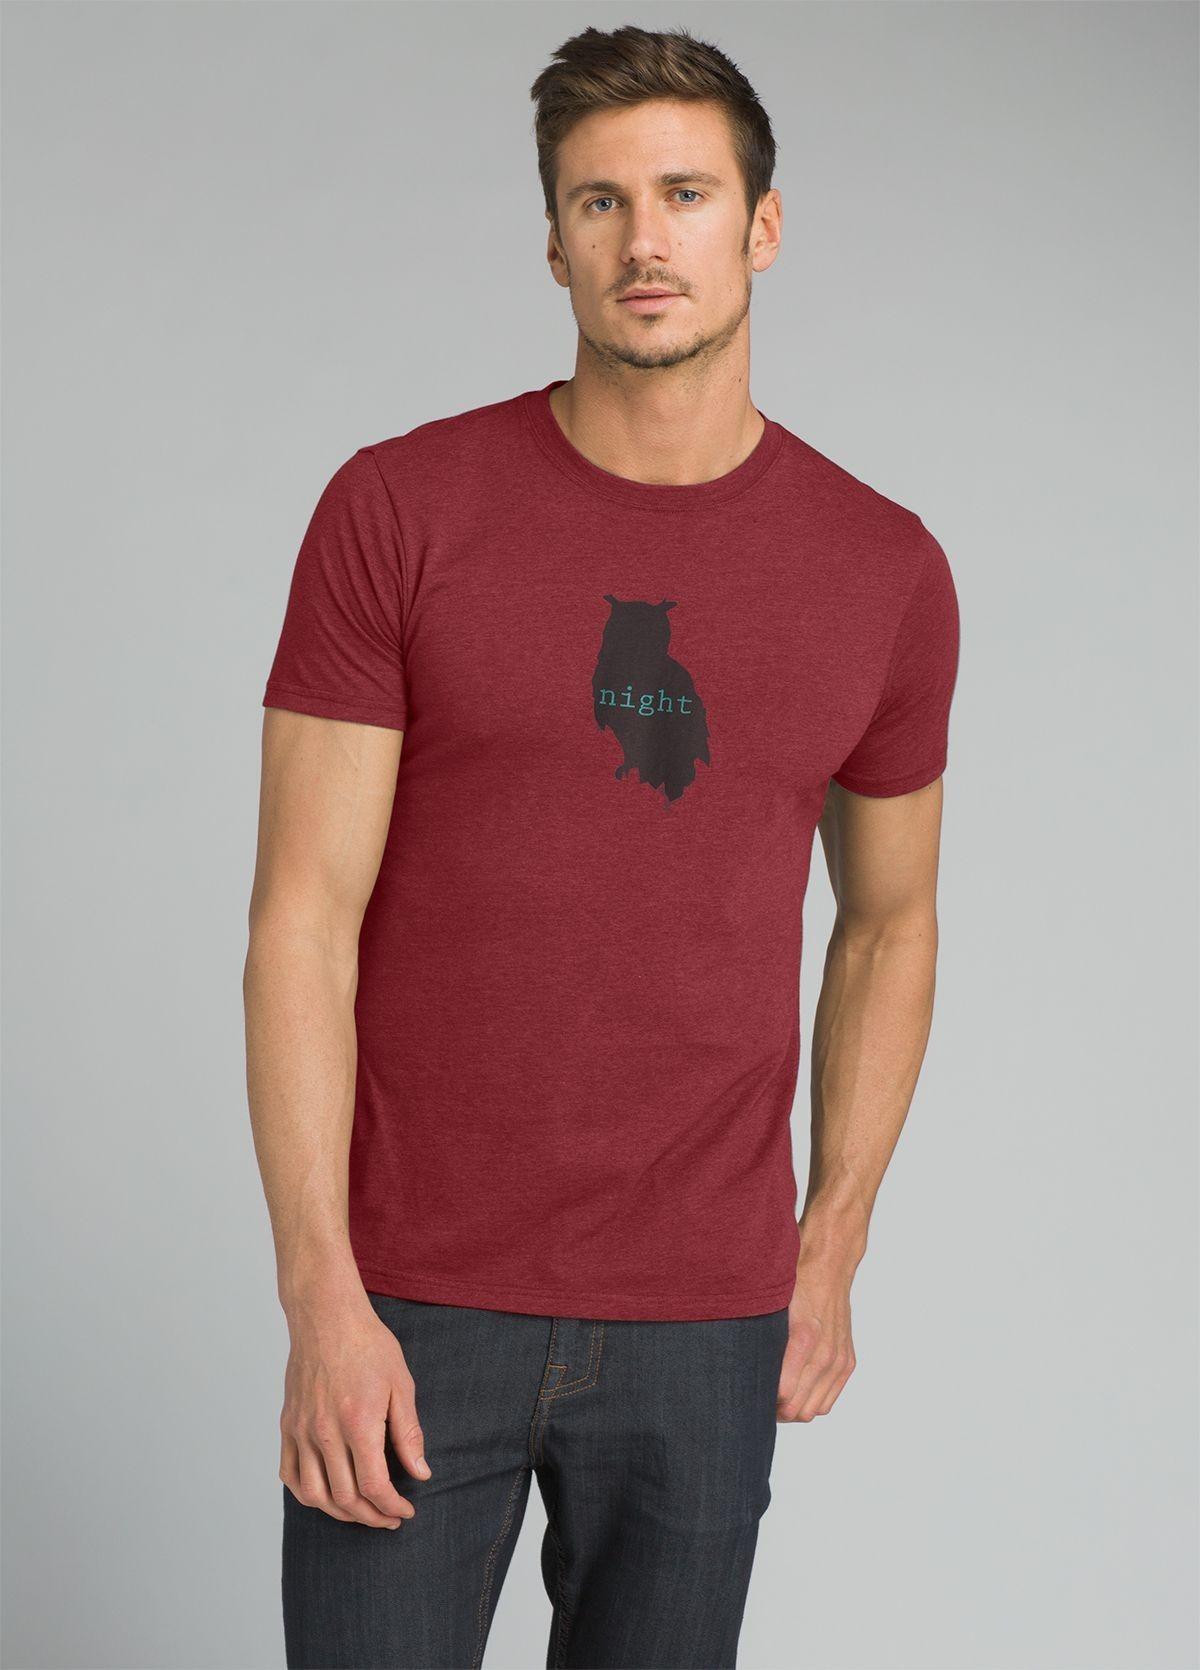 prAna Night Owl Journeyman Tee Shirt JRI1PNOWL